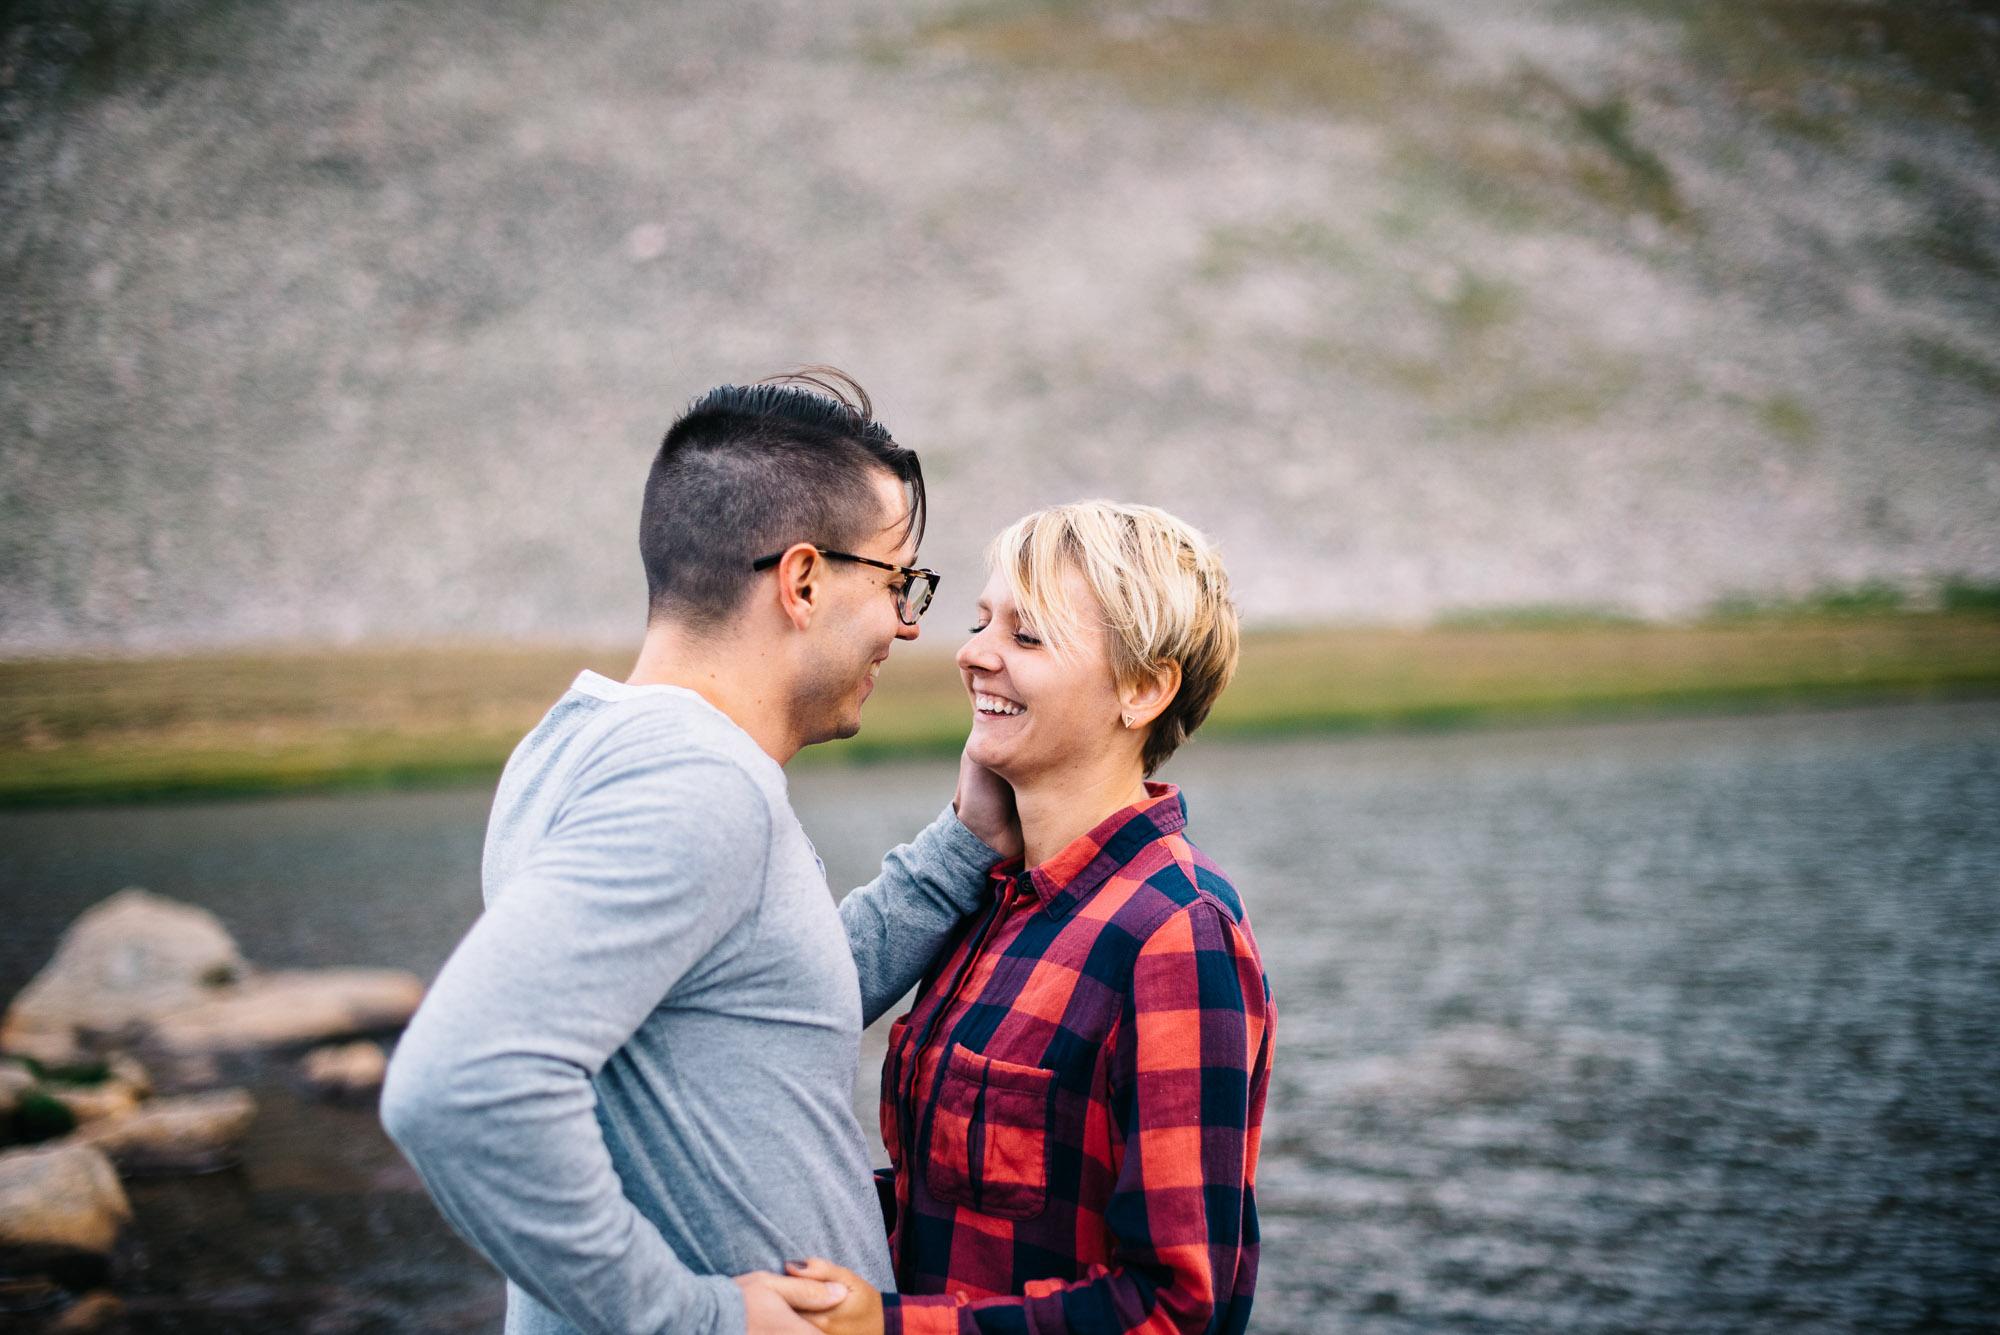 71-64couple-anniversary-engagement-photographer-colorado-Jeremy&Lindsay-Tosh-August2017-0260.jpg